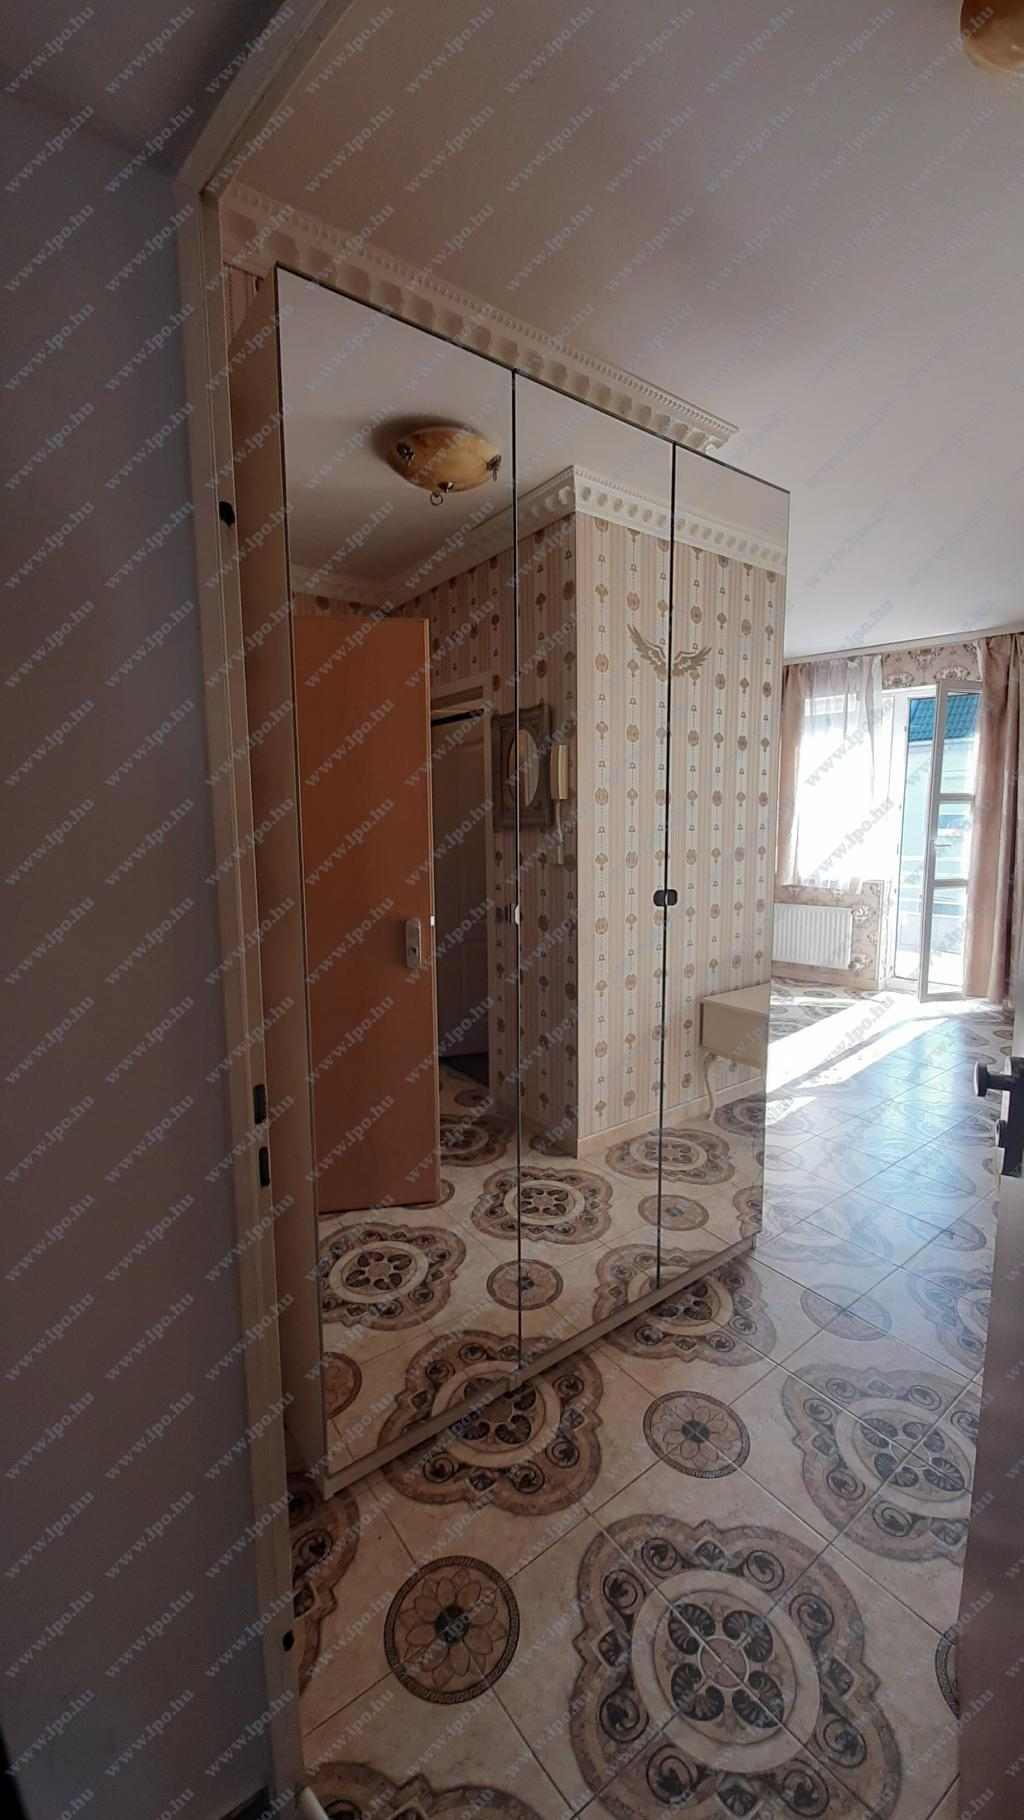 flat For rent 1043 Budapest Munkásotthon utca 47sqm 130000 HUF/month Property image: 1